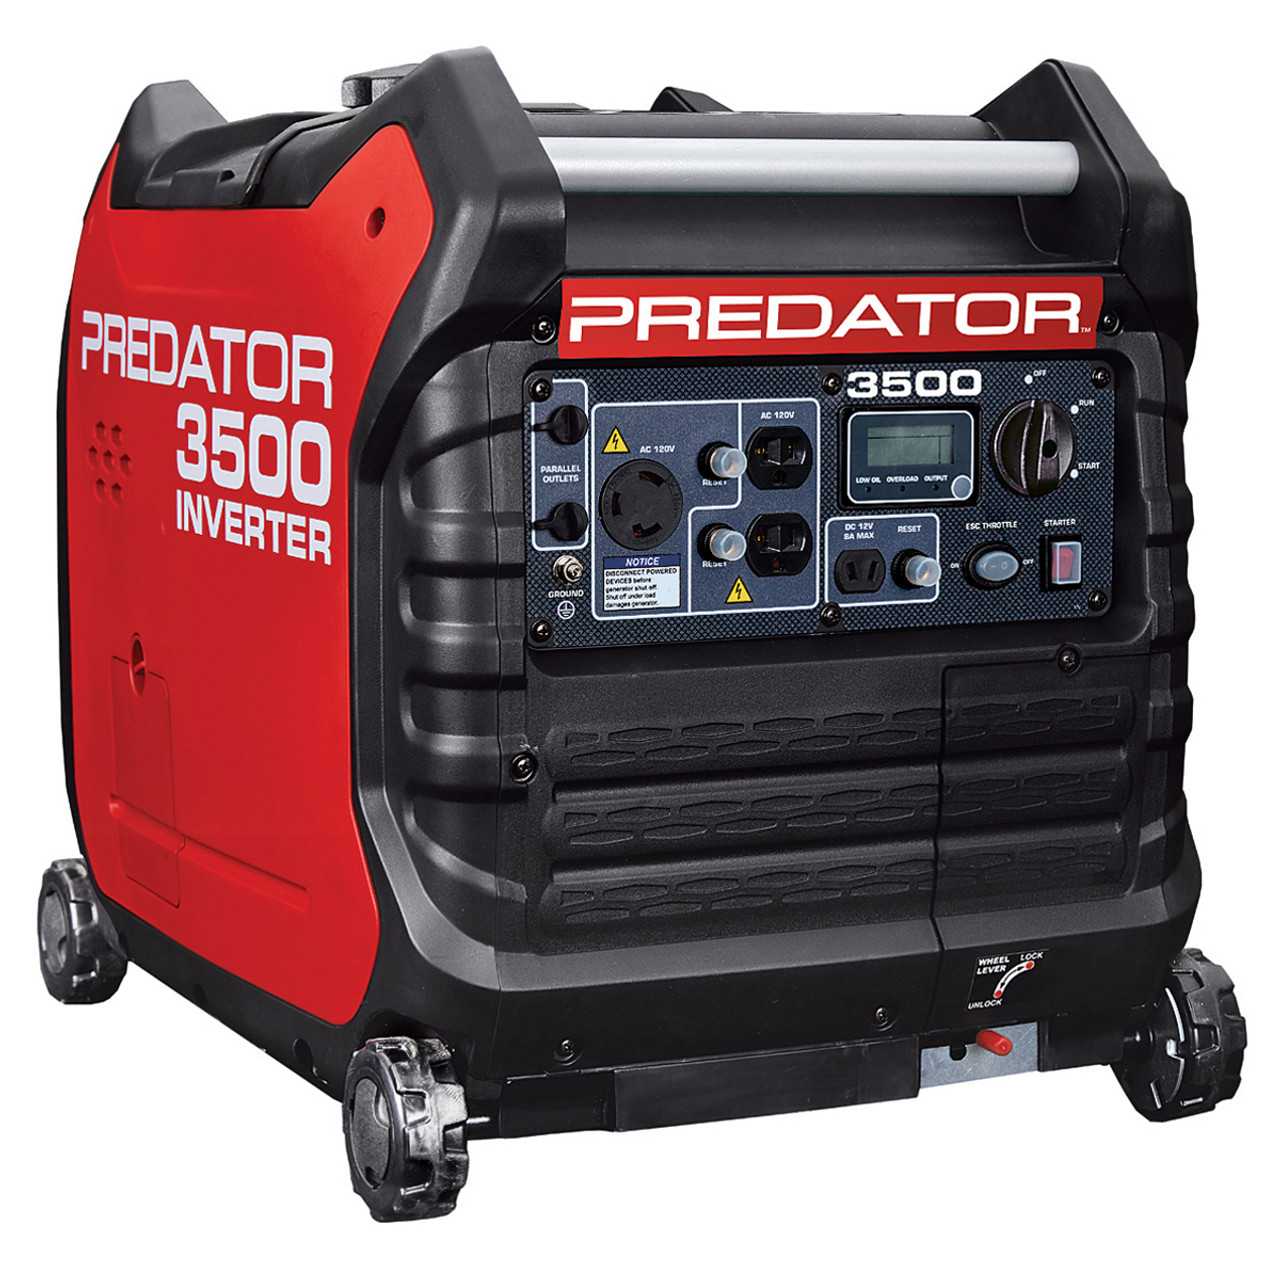 Predator 3500